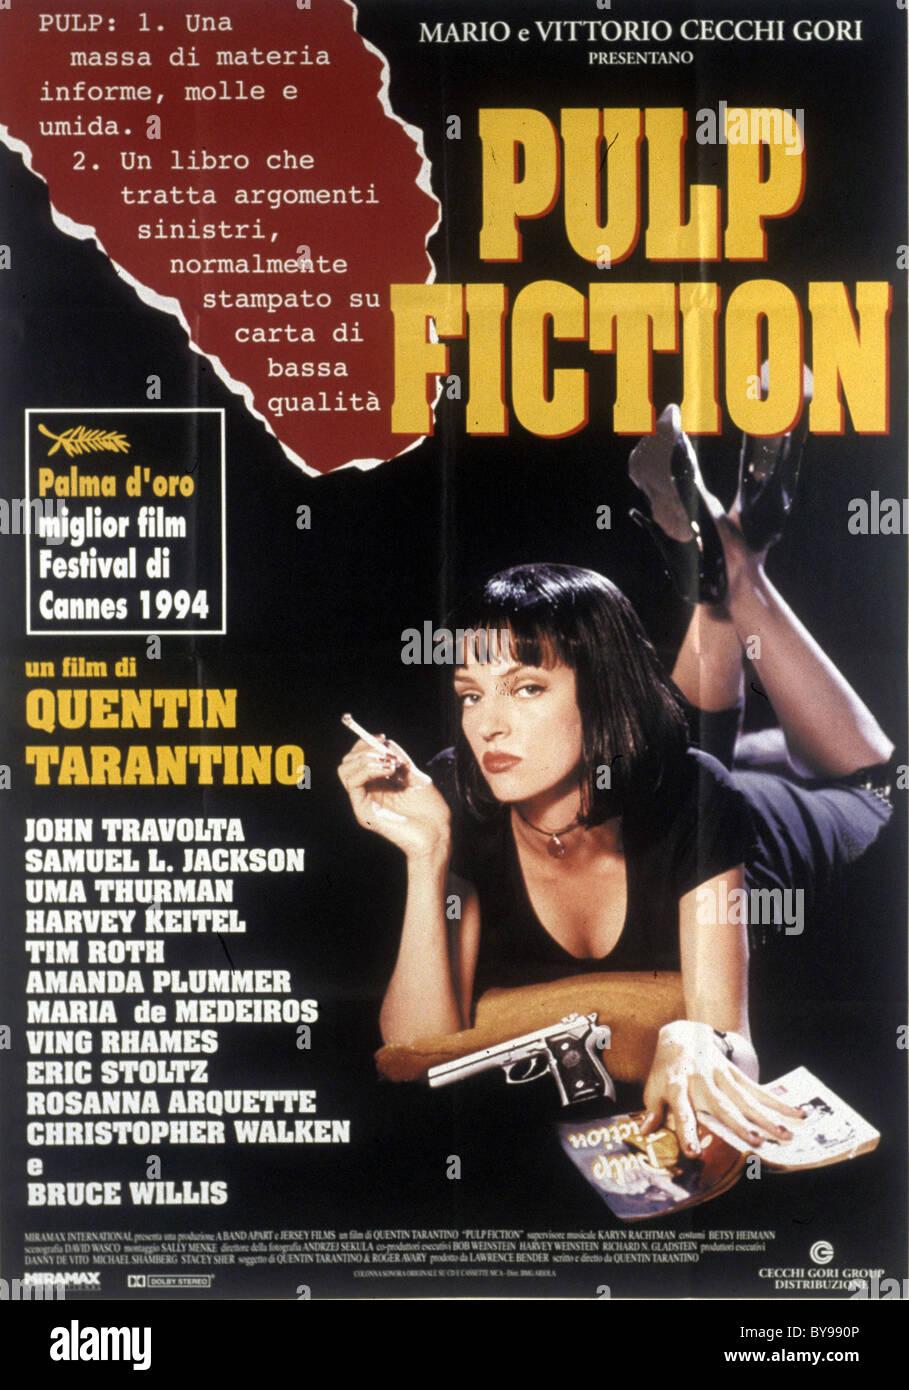 Pulp Fiction Jahr: 1994 - USA Regie: Quentin Tarantino Uma Thurman Film Poster (It) Goldene Palme Cannes 1994 Stockbild